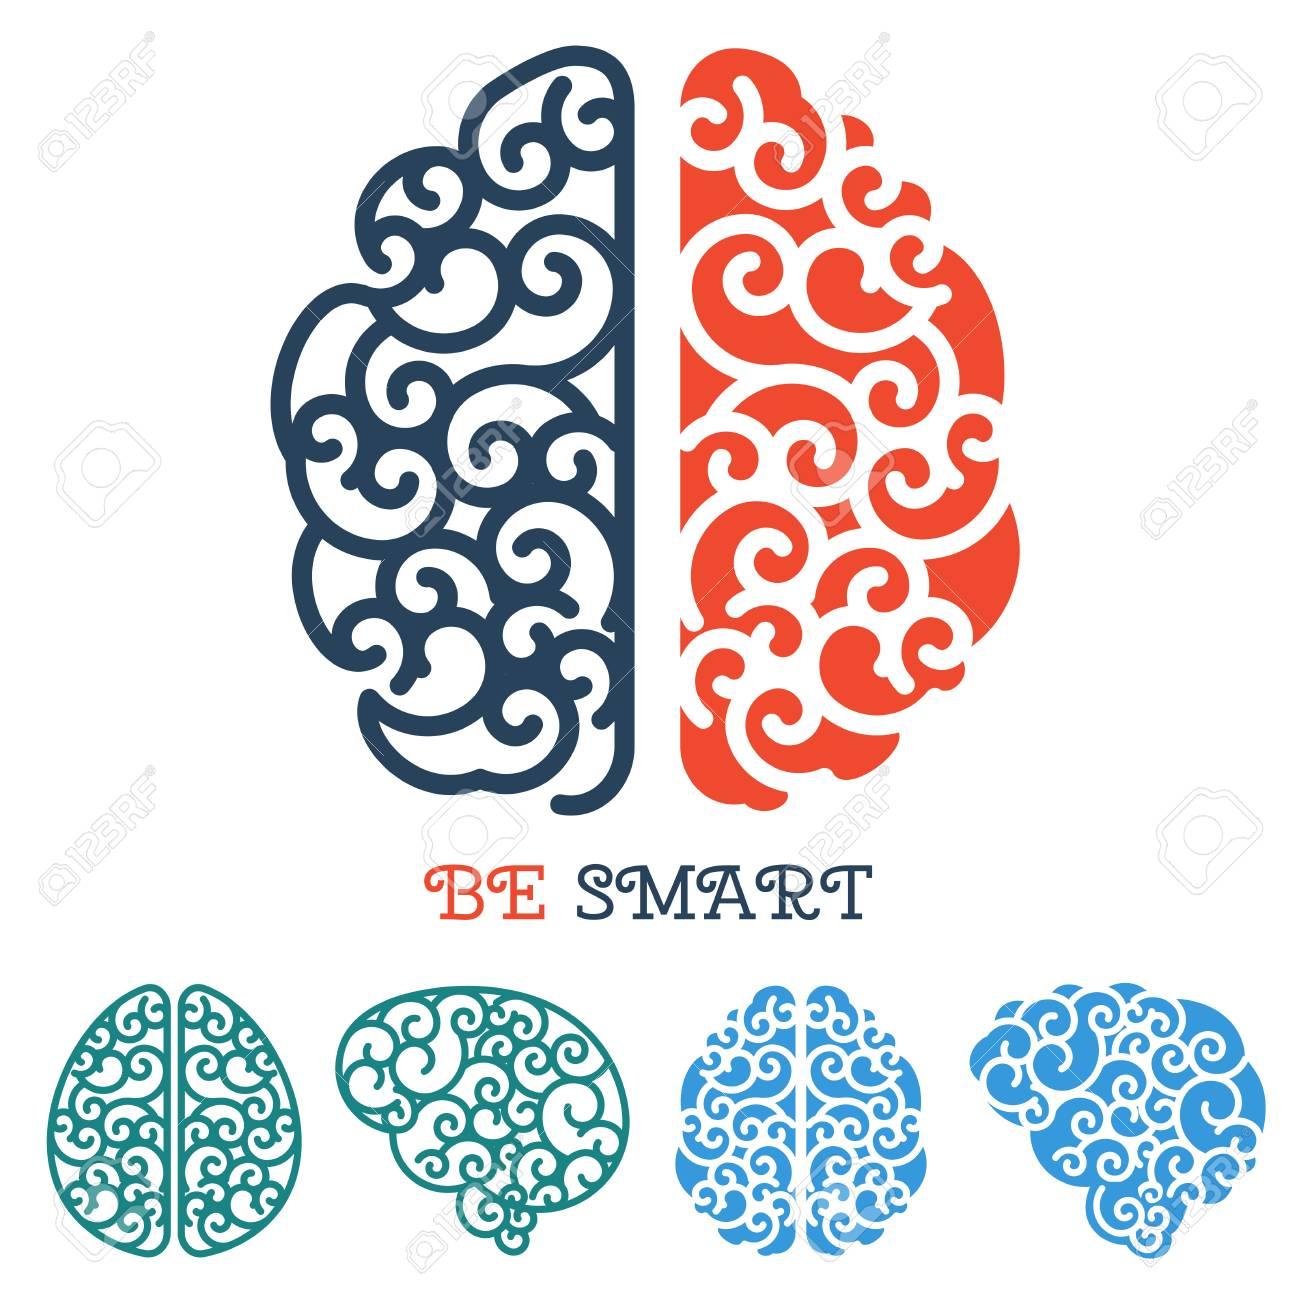 Human Linear Brain Anatomy Thinking Label Vector Intelligence ...